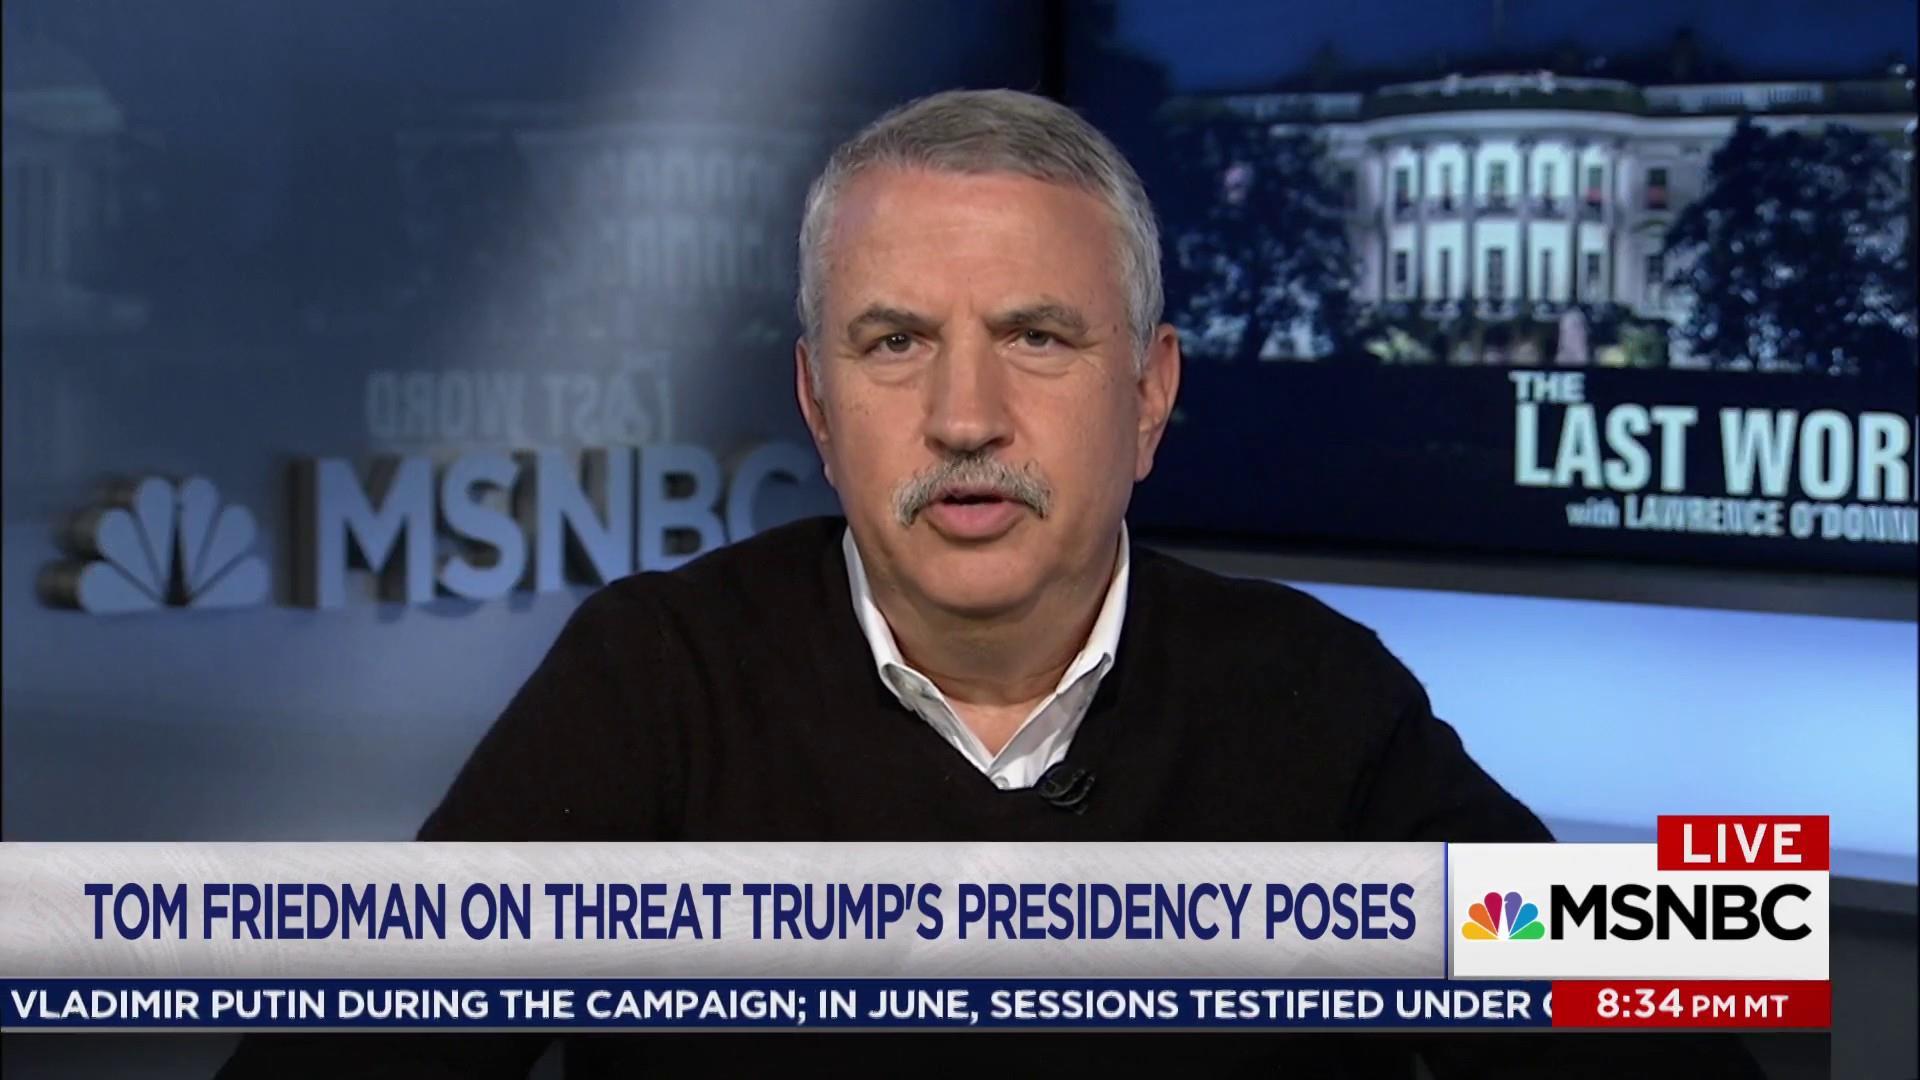 Thomas Friedman: 'Trump is a chump'